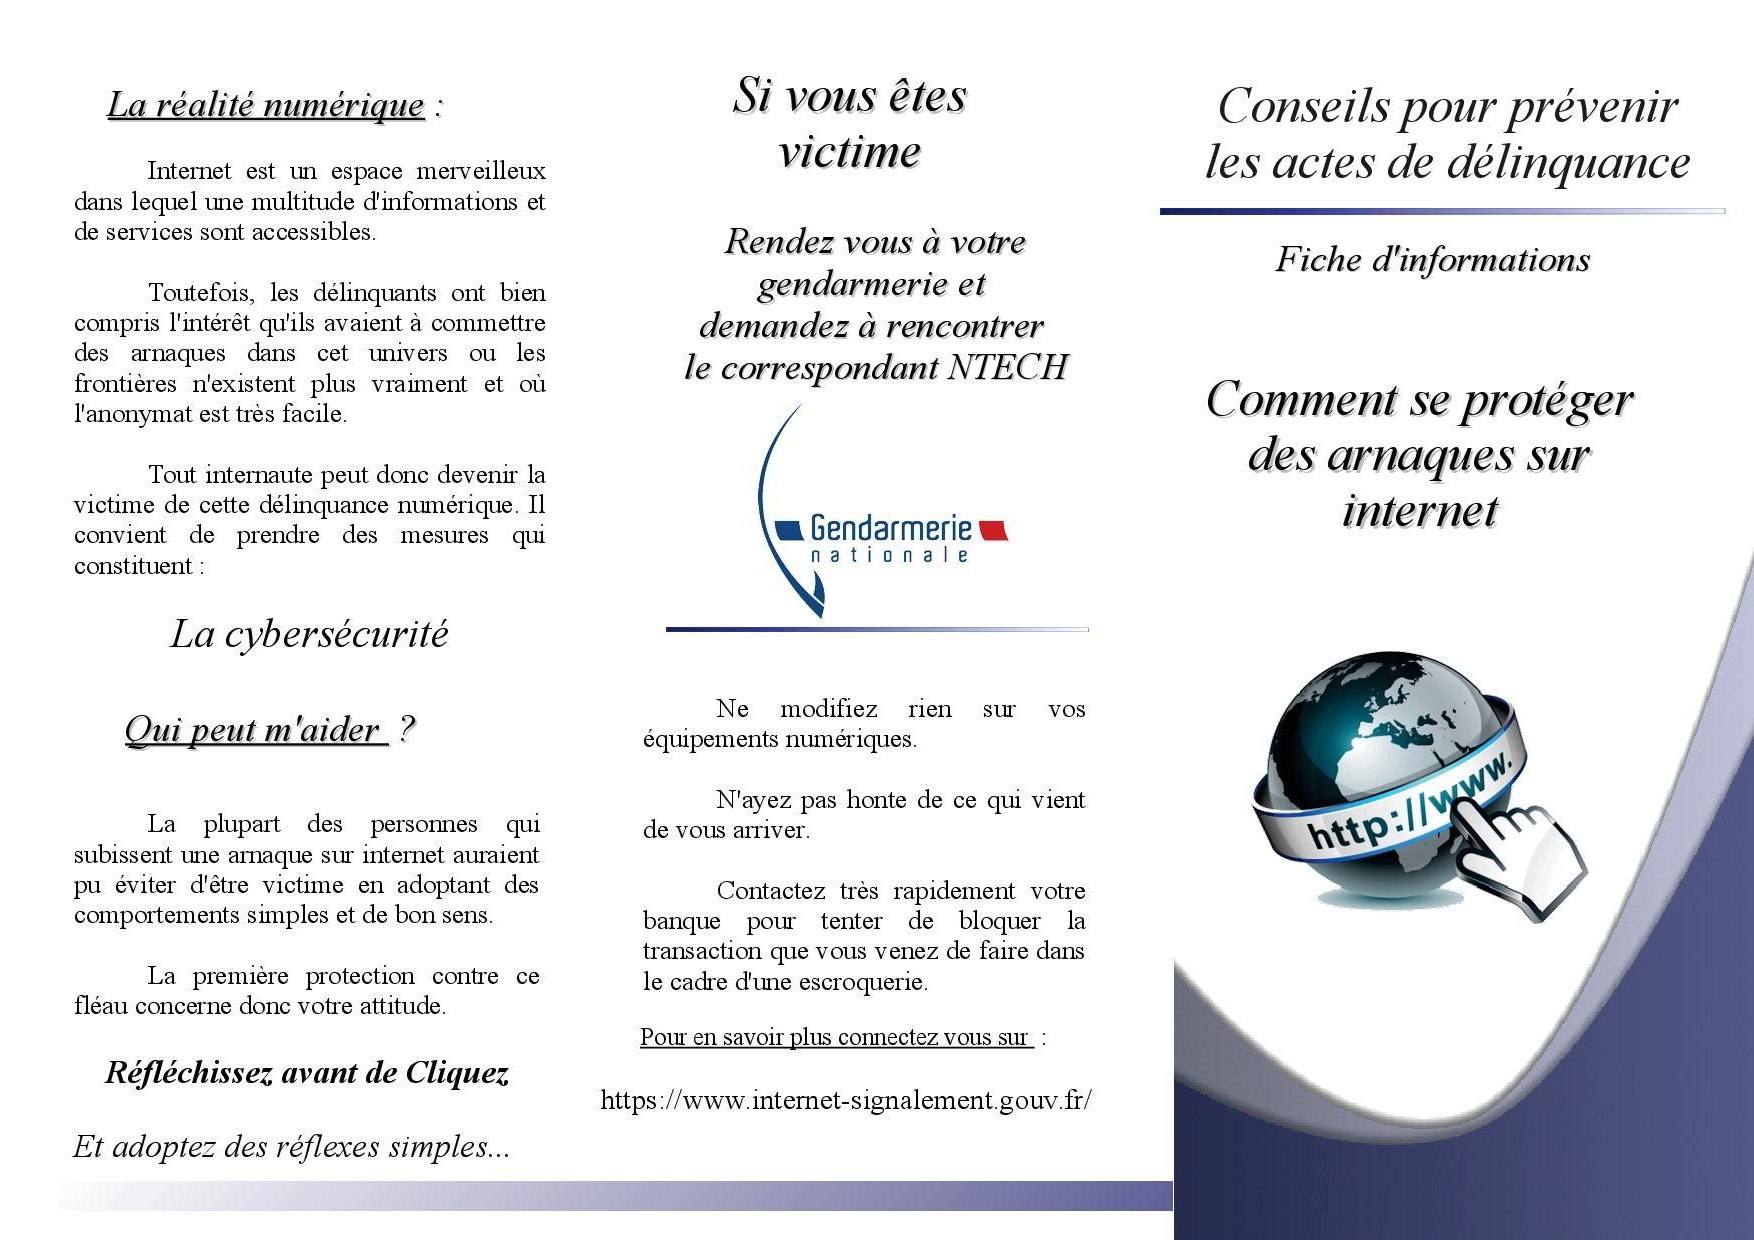 Plaquette information protection contre les cyber attaque mars 2017 01